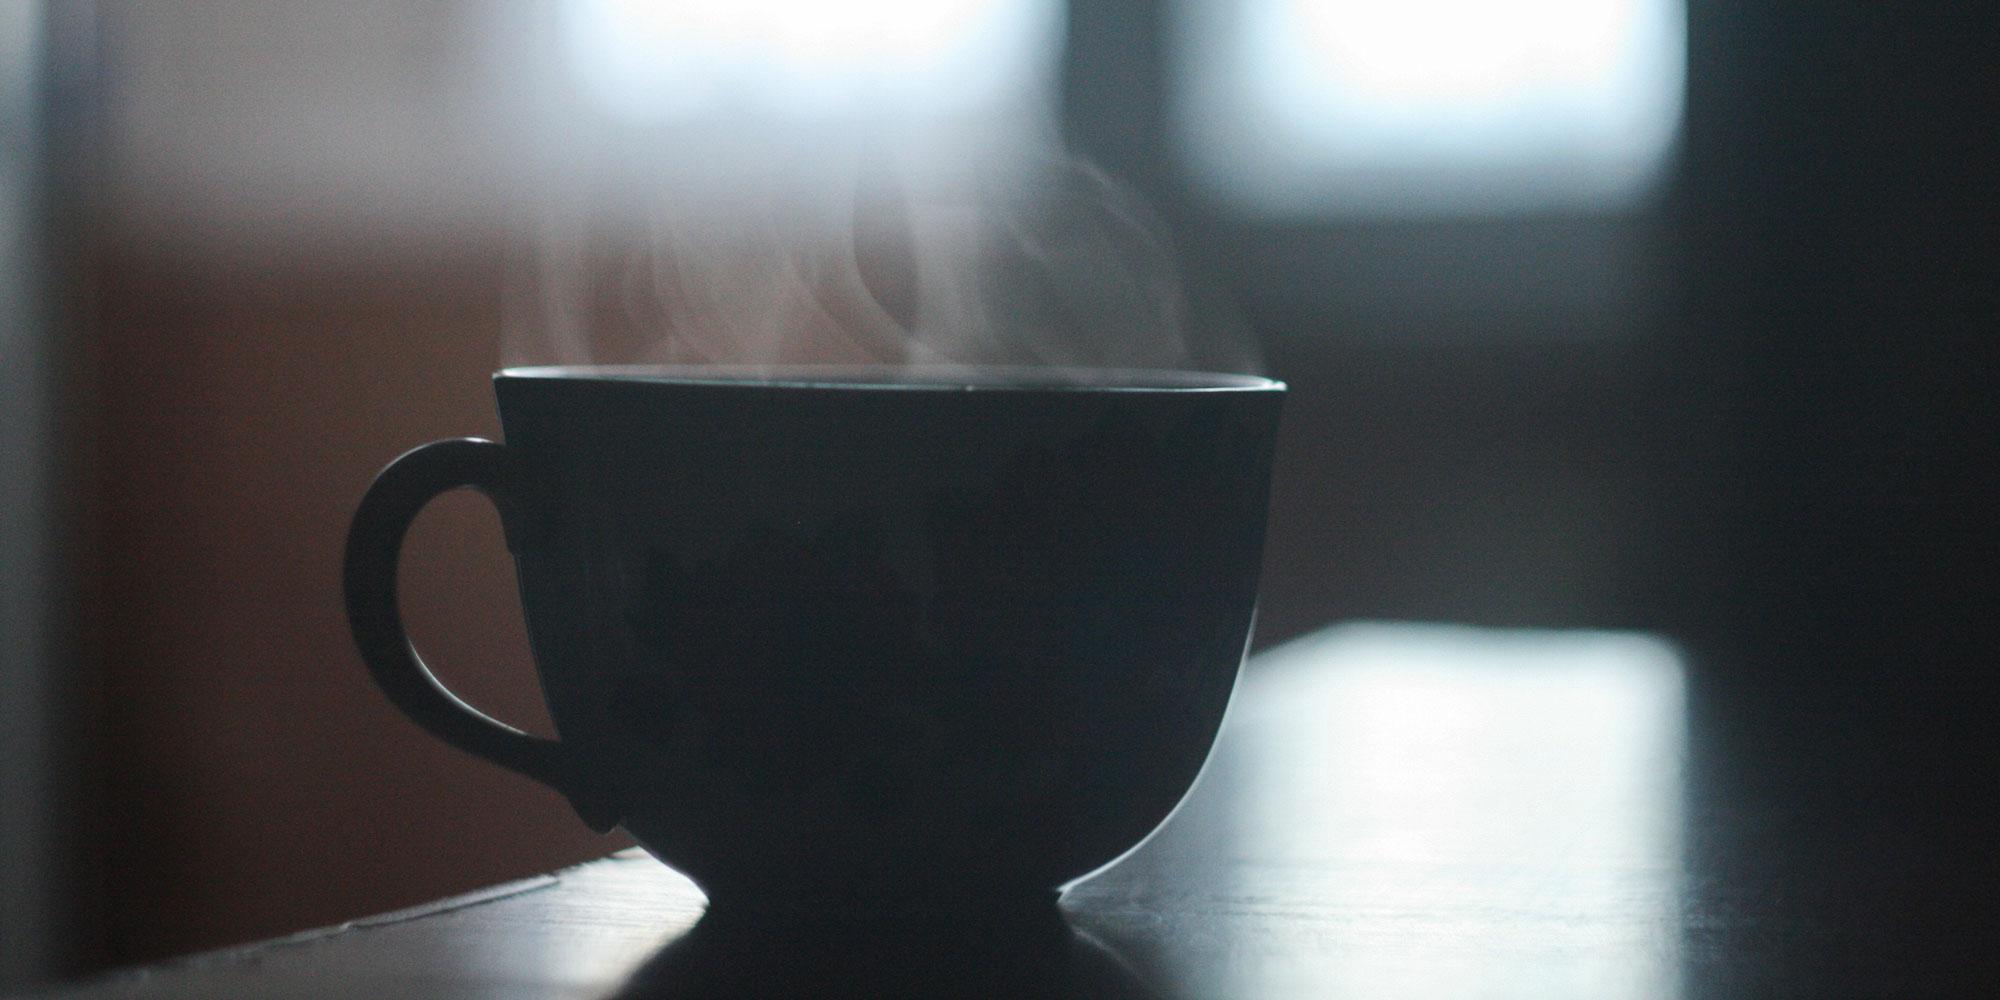 steaming mug of tea